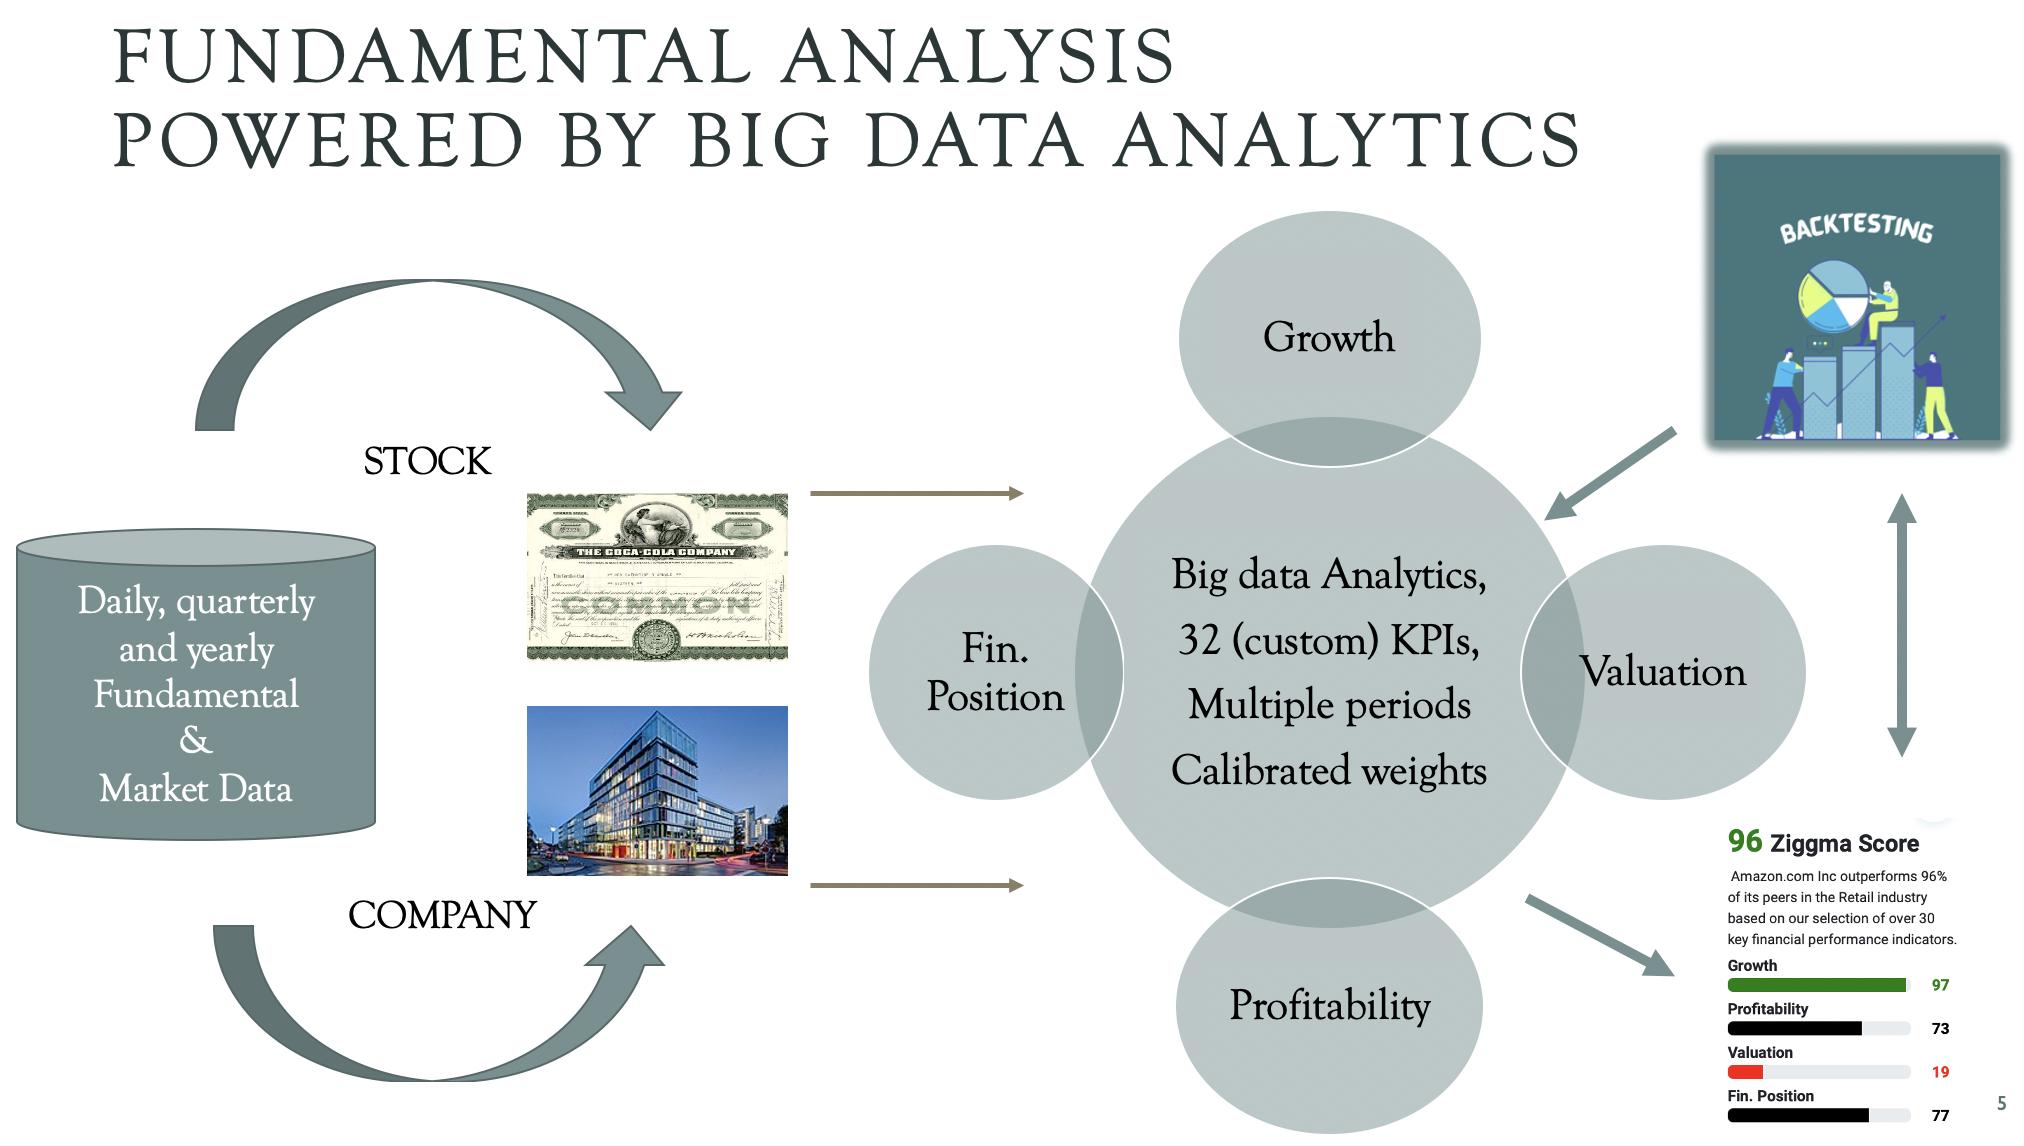 fundamental analysis powered by big data analytics